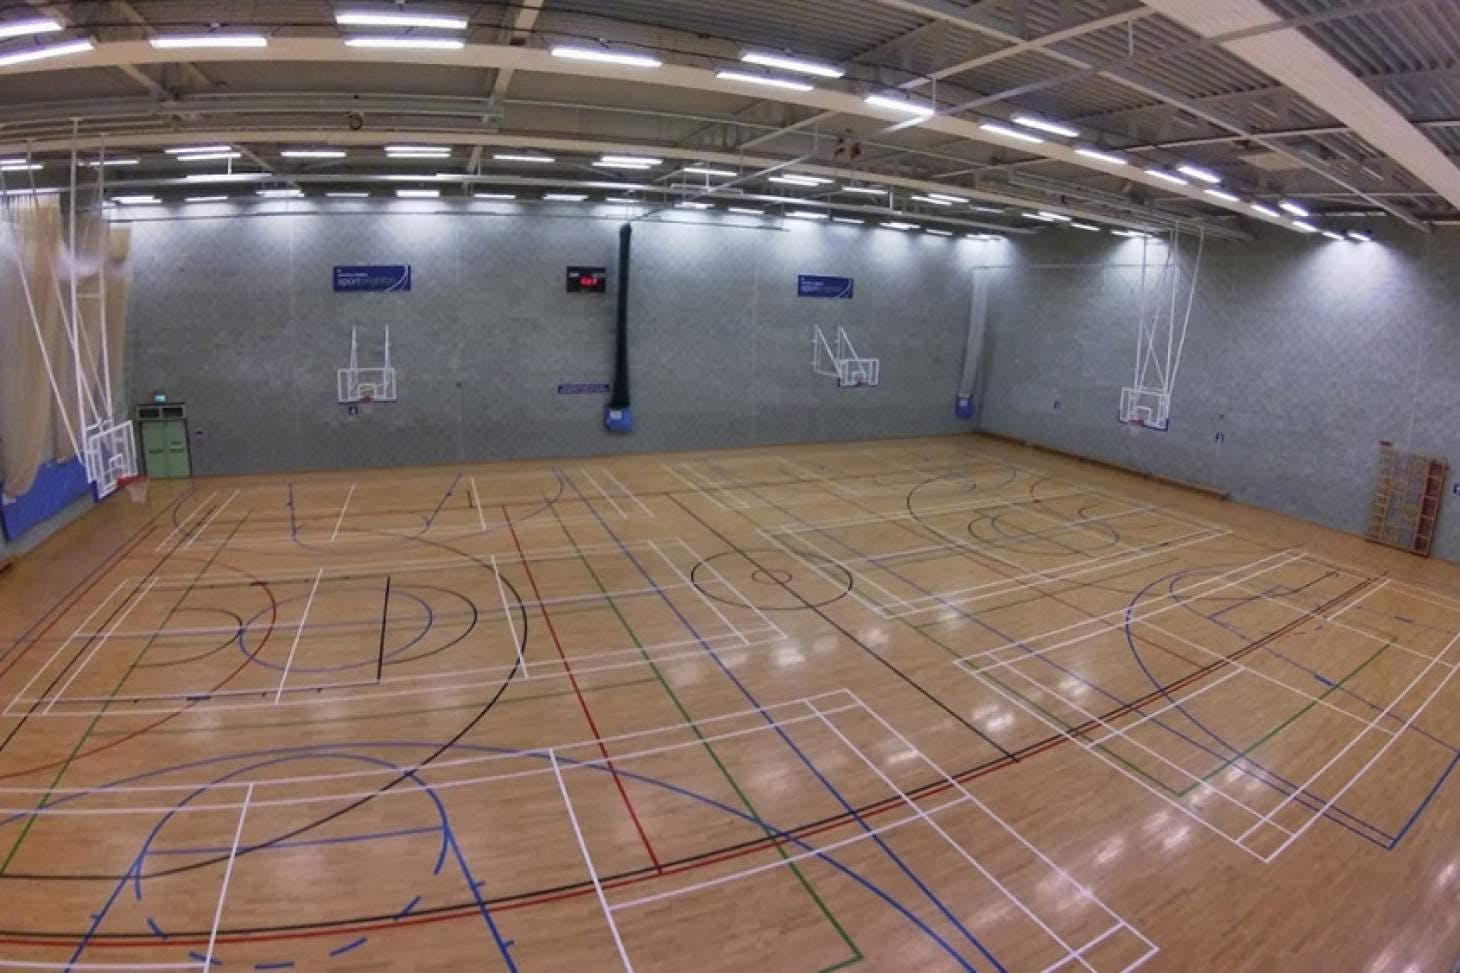 University Of Brighton (Falmer Campus) Nets | Sports hall cricket facilities